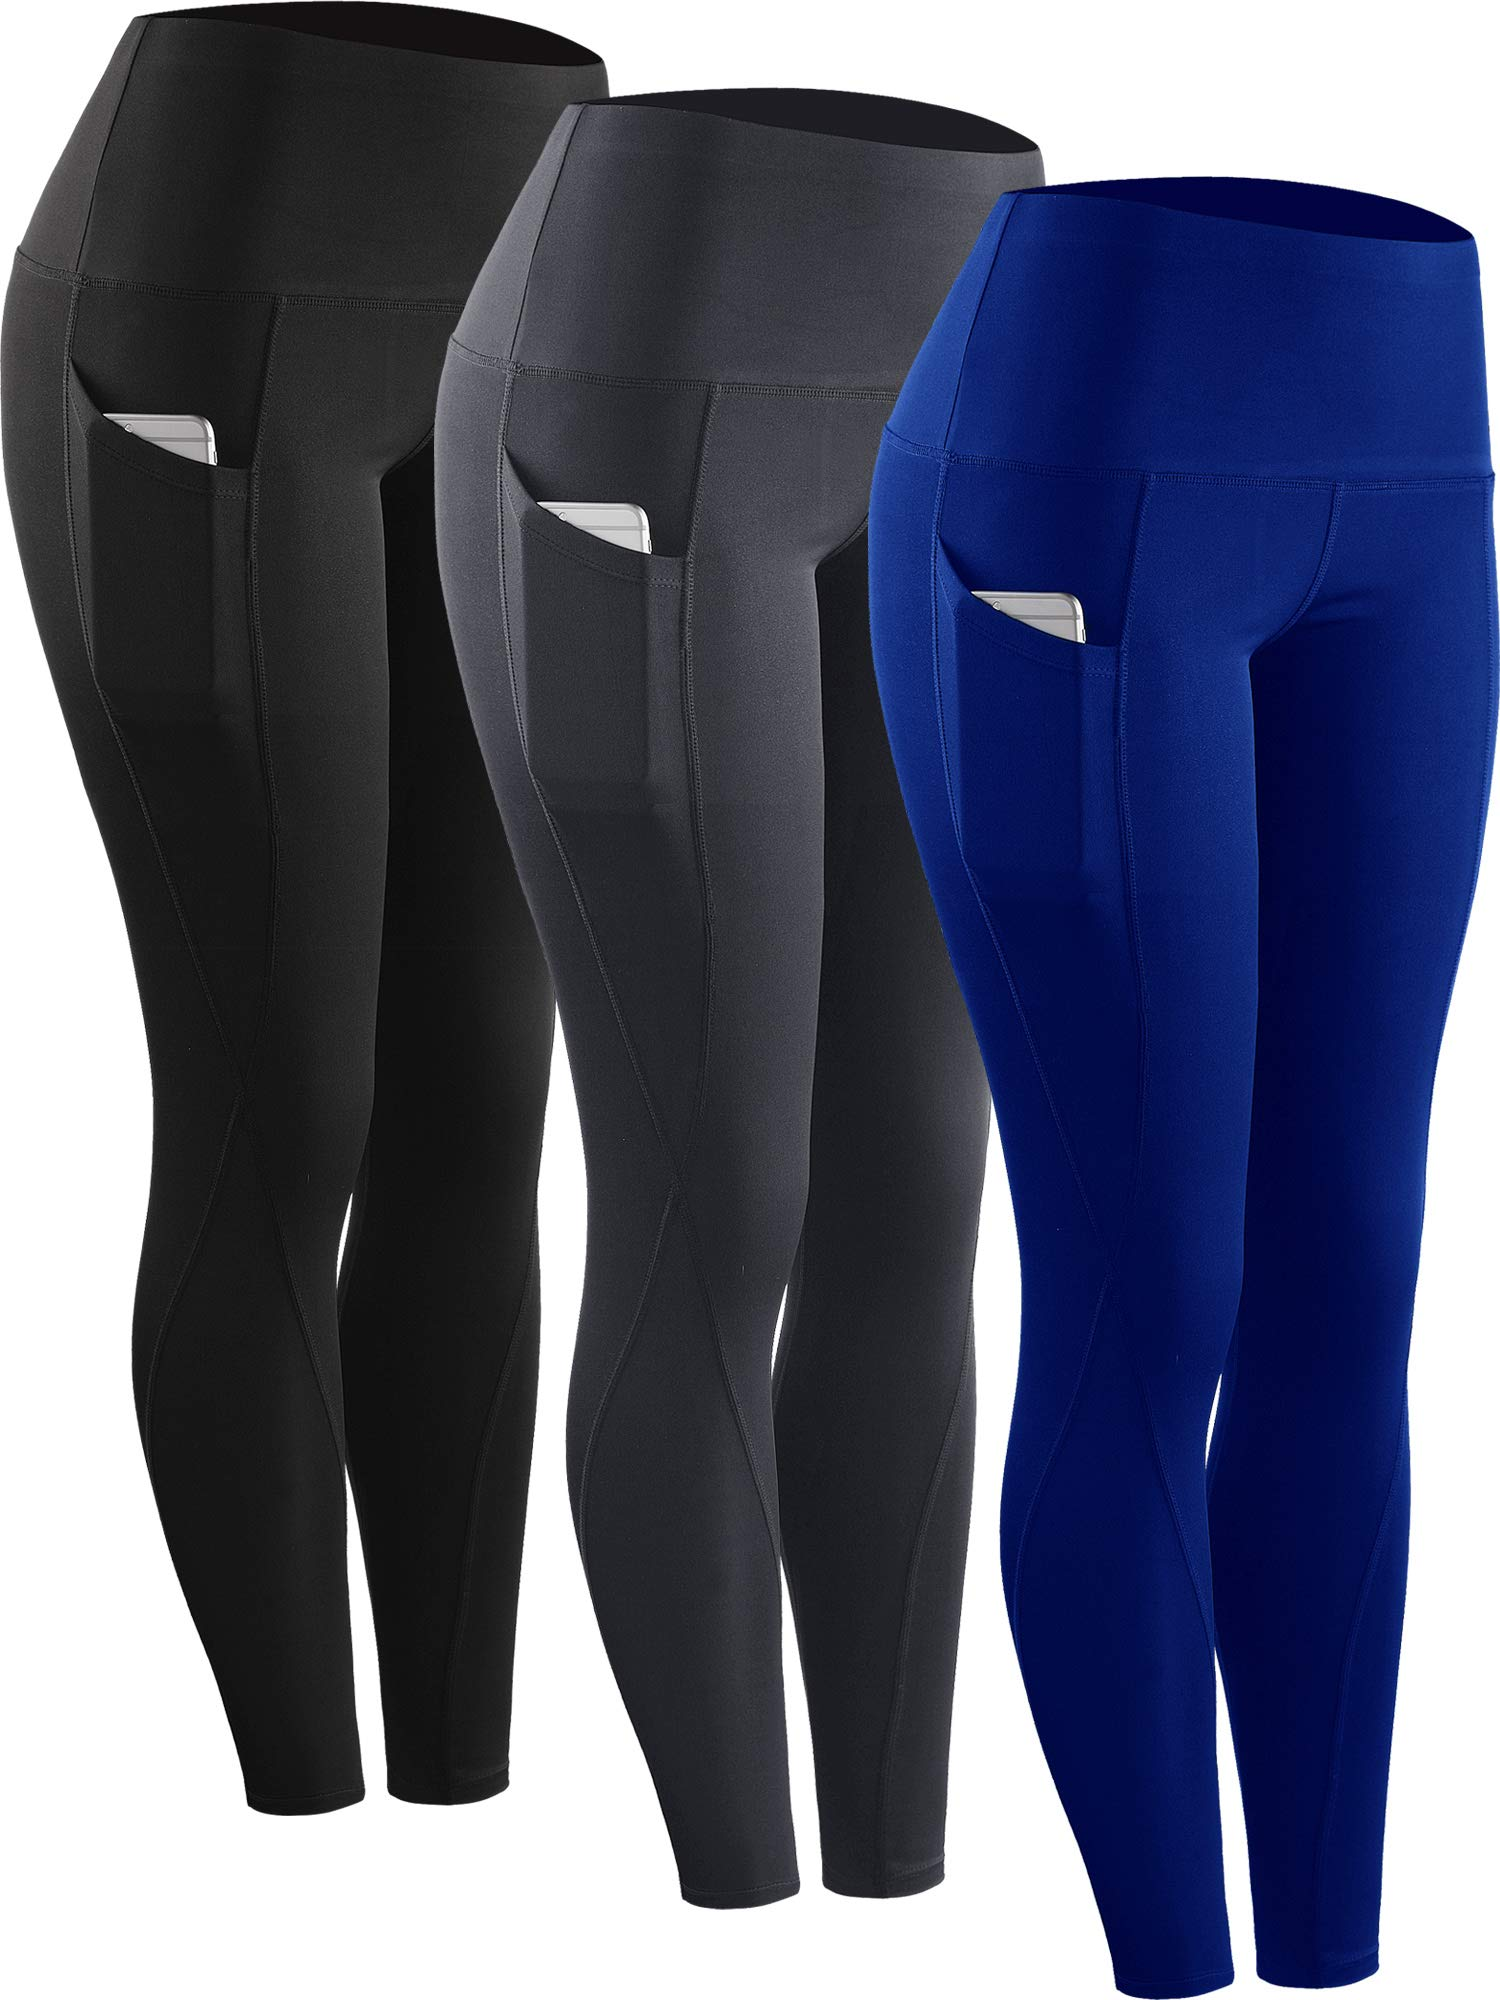 Neleus 3 Pack Tummy Control High Waist Running Workout Leggings,9017,Black,Grey,Blue,US 2XL,EU 3XL by Neleus